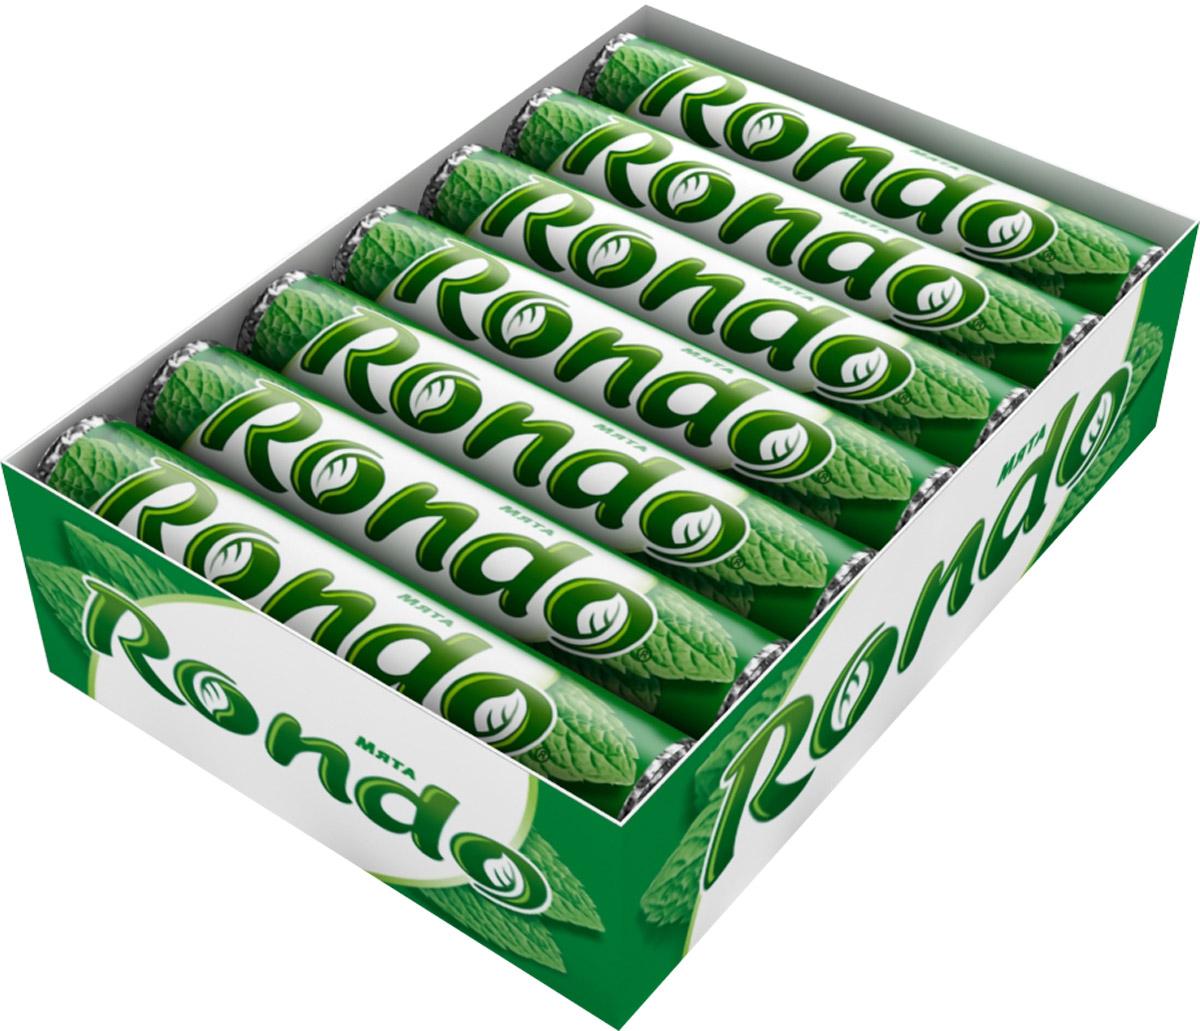 Rondo Мята освежающие конфеты, 14 пачек по 30 г освежающие конфеты rondo арбуз 30г